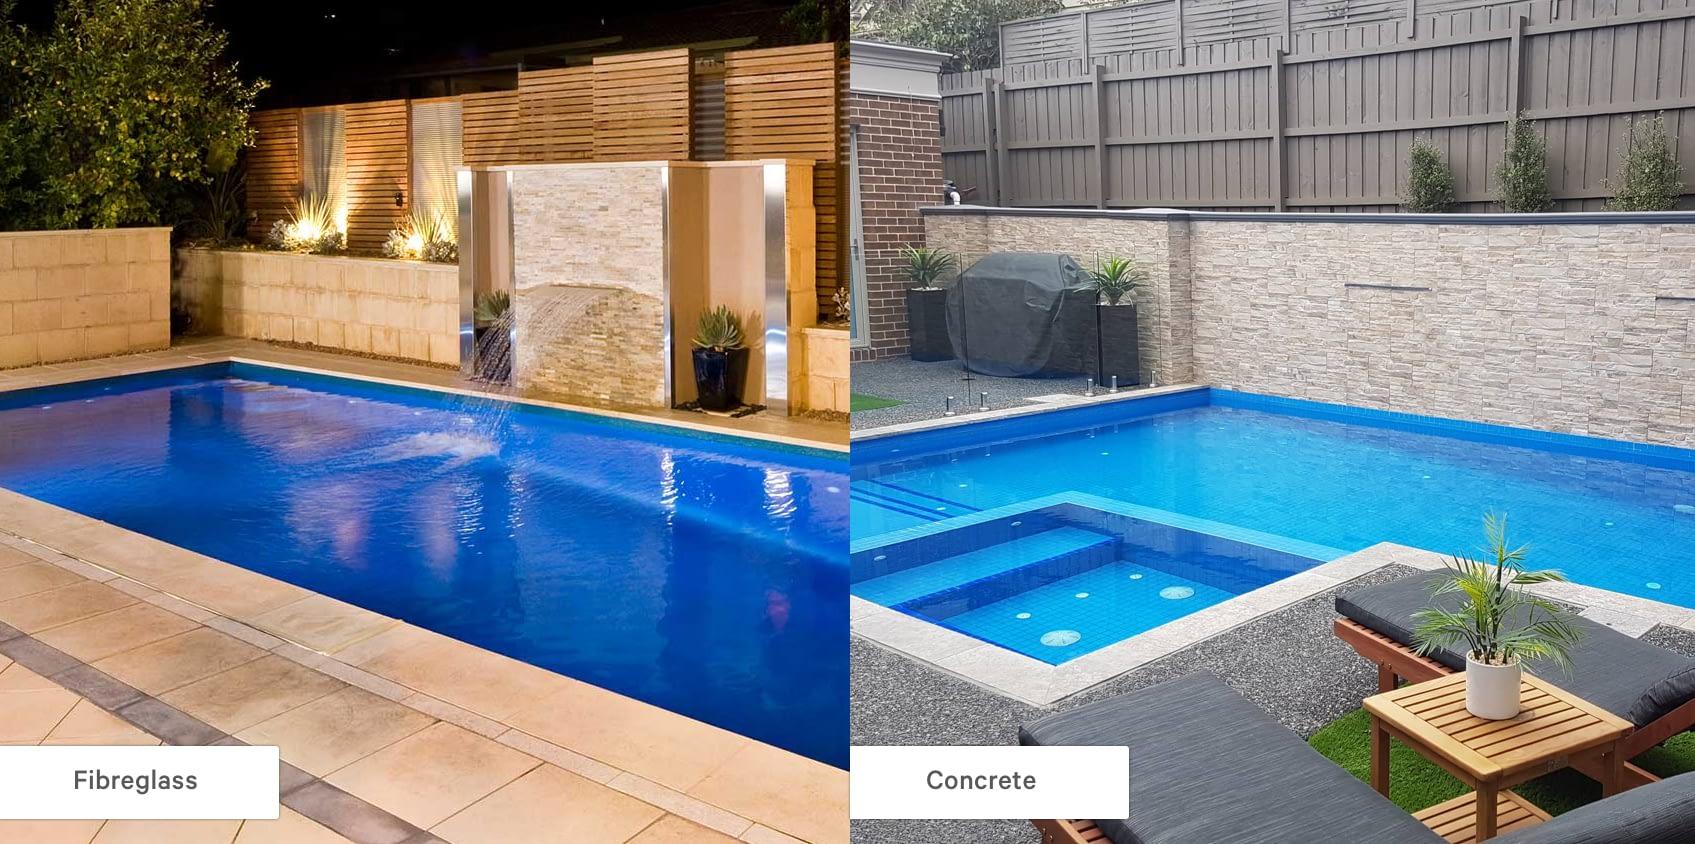 concrete vs fibreglass pool